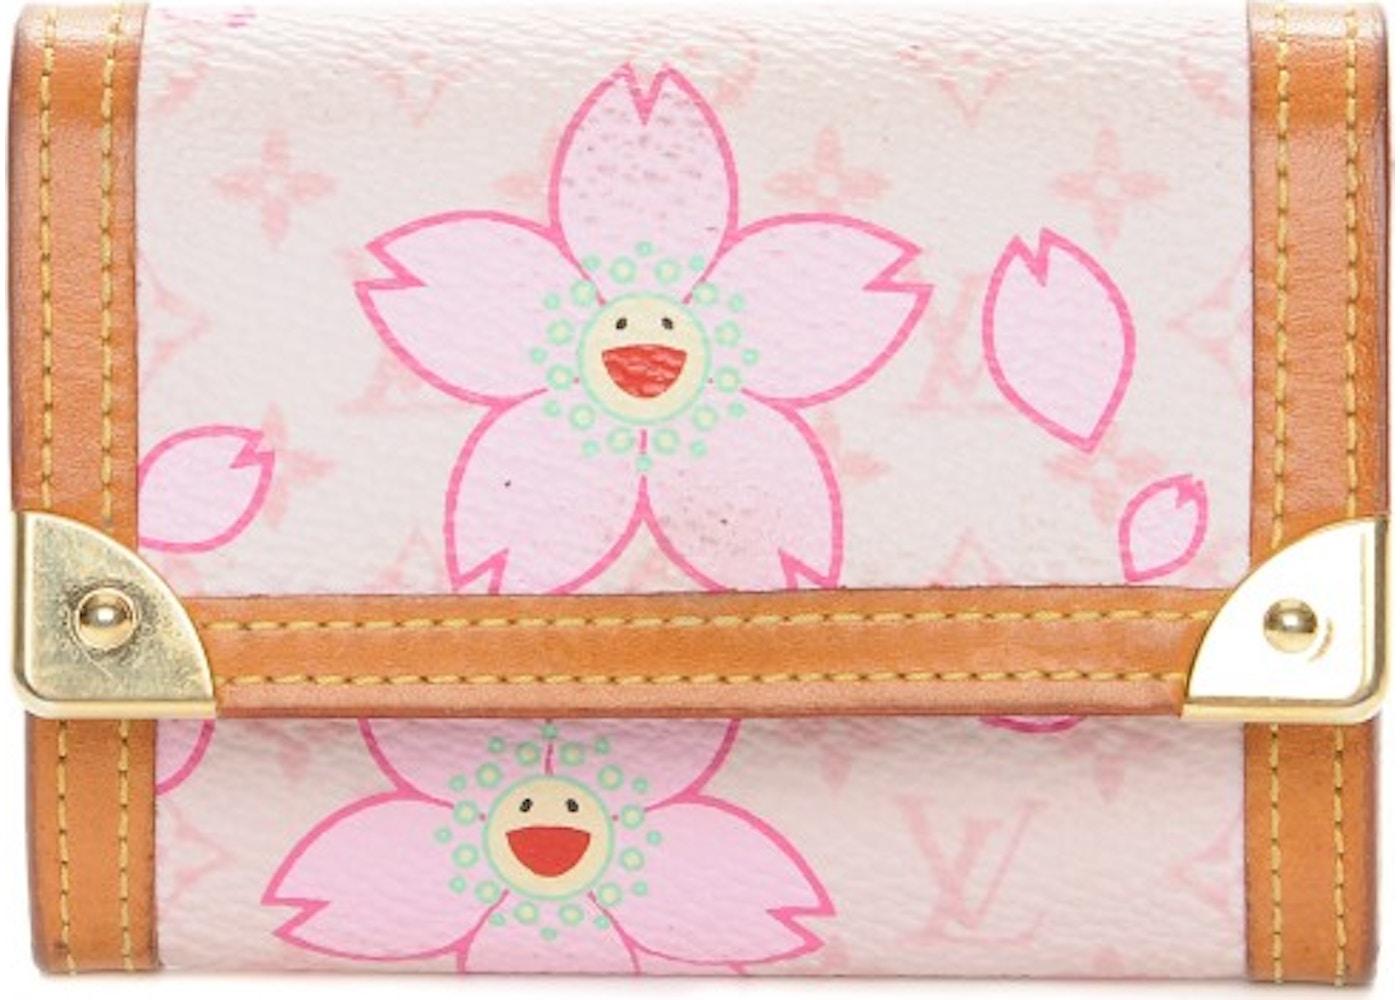 7c69717fdebd Louis Vuitton Coin Purse Porte Monnaie Plat Monogram Cherry Blossom Pink.  Monogram Cherry Blossom Pink